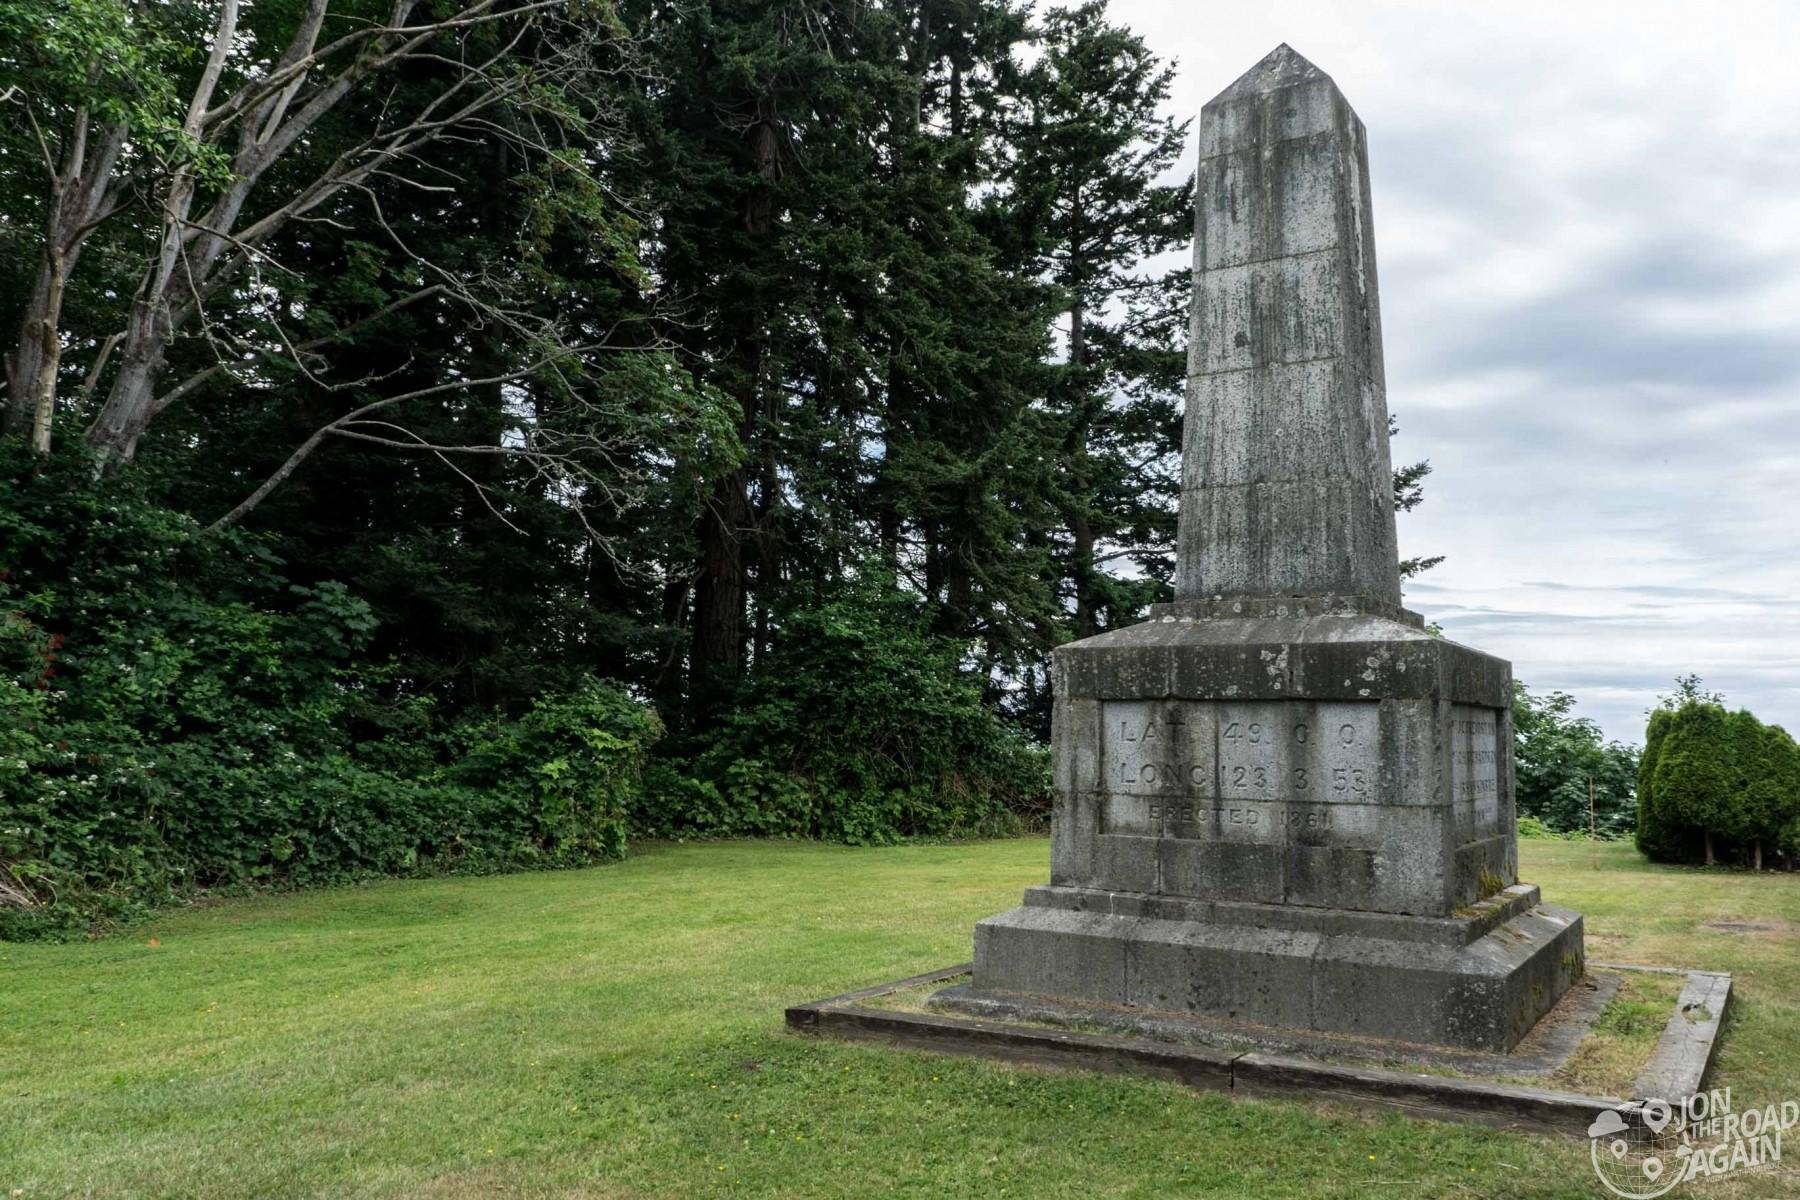 US / Canadian Border Obelisk at Point Roberts